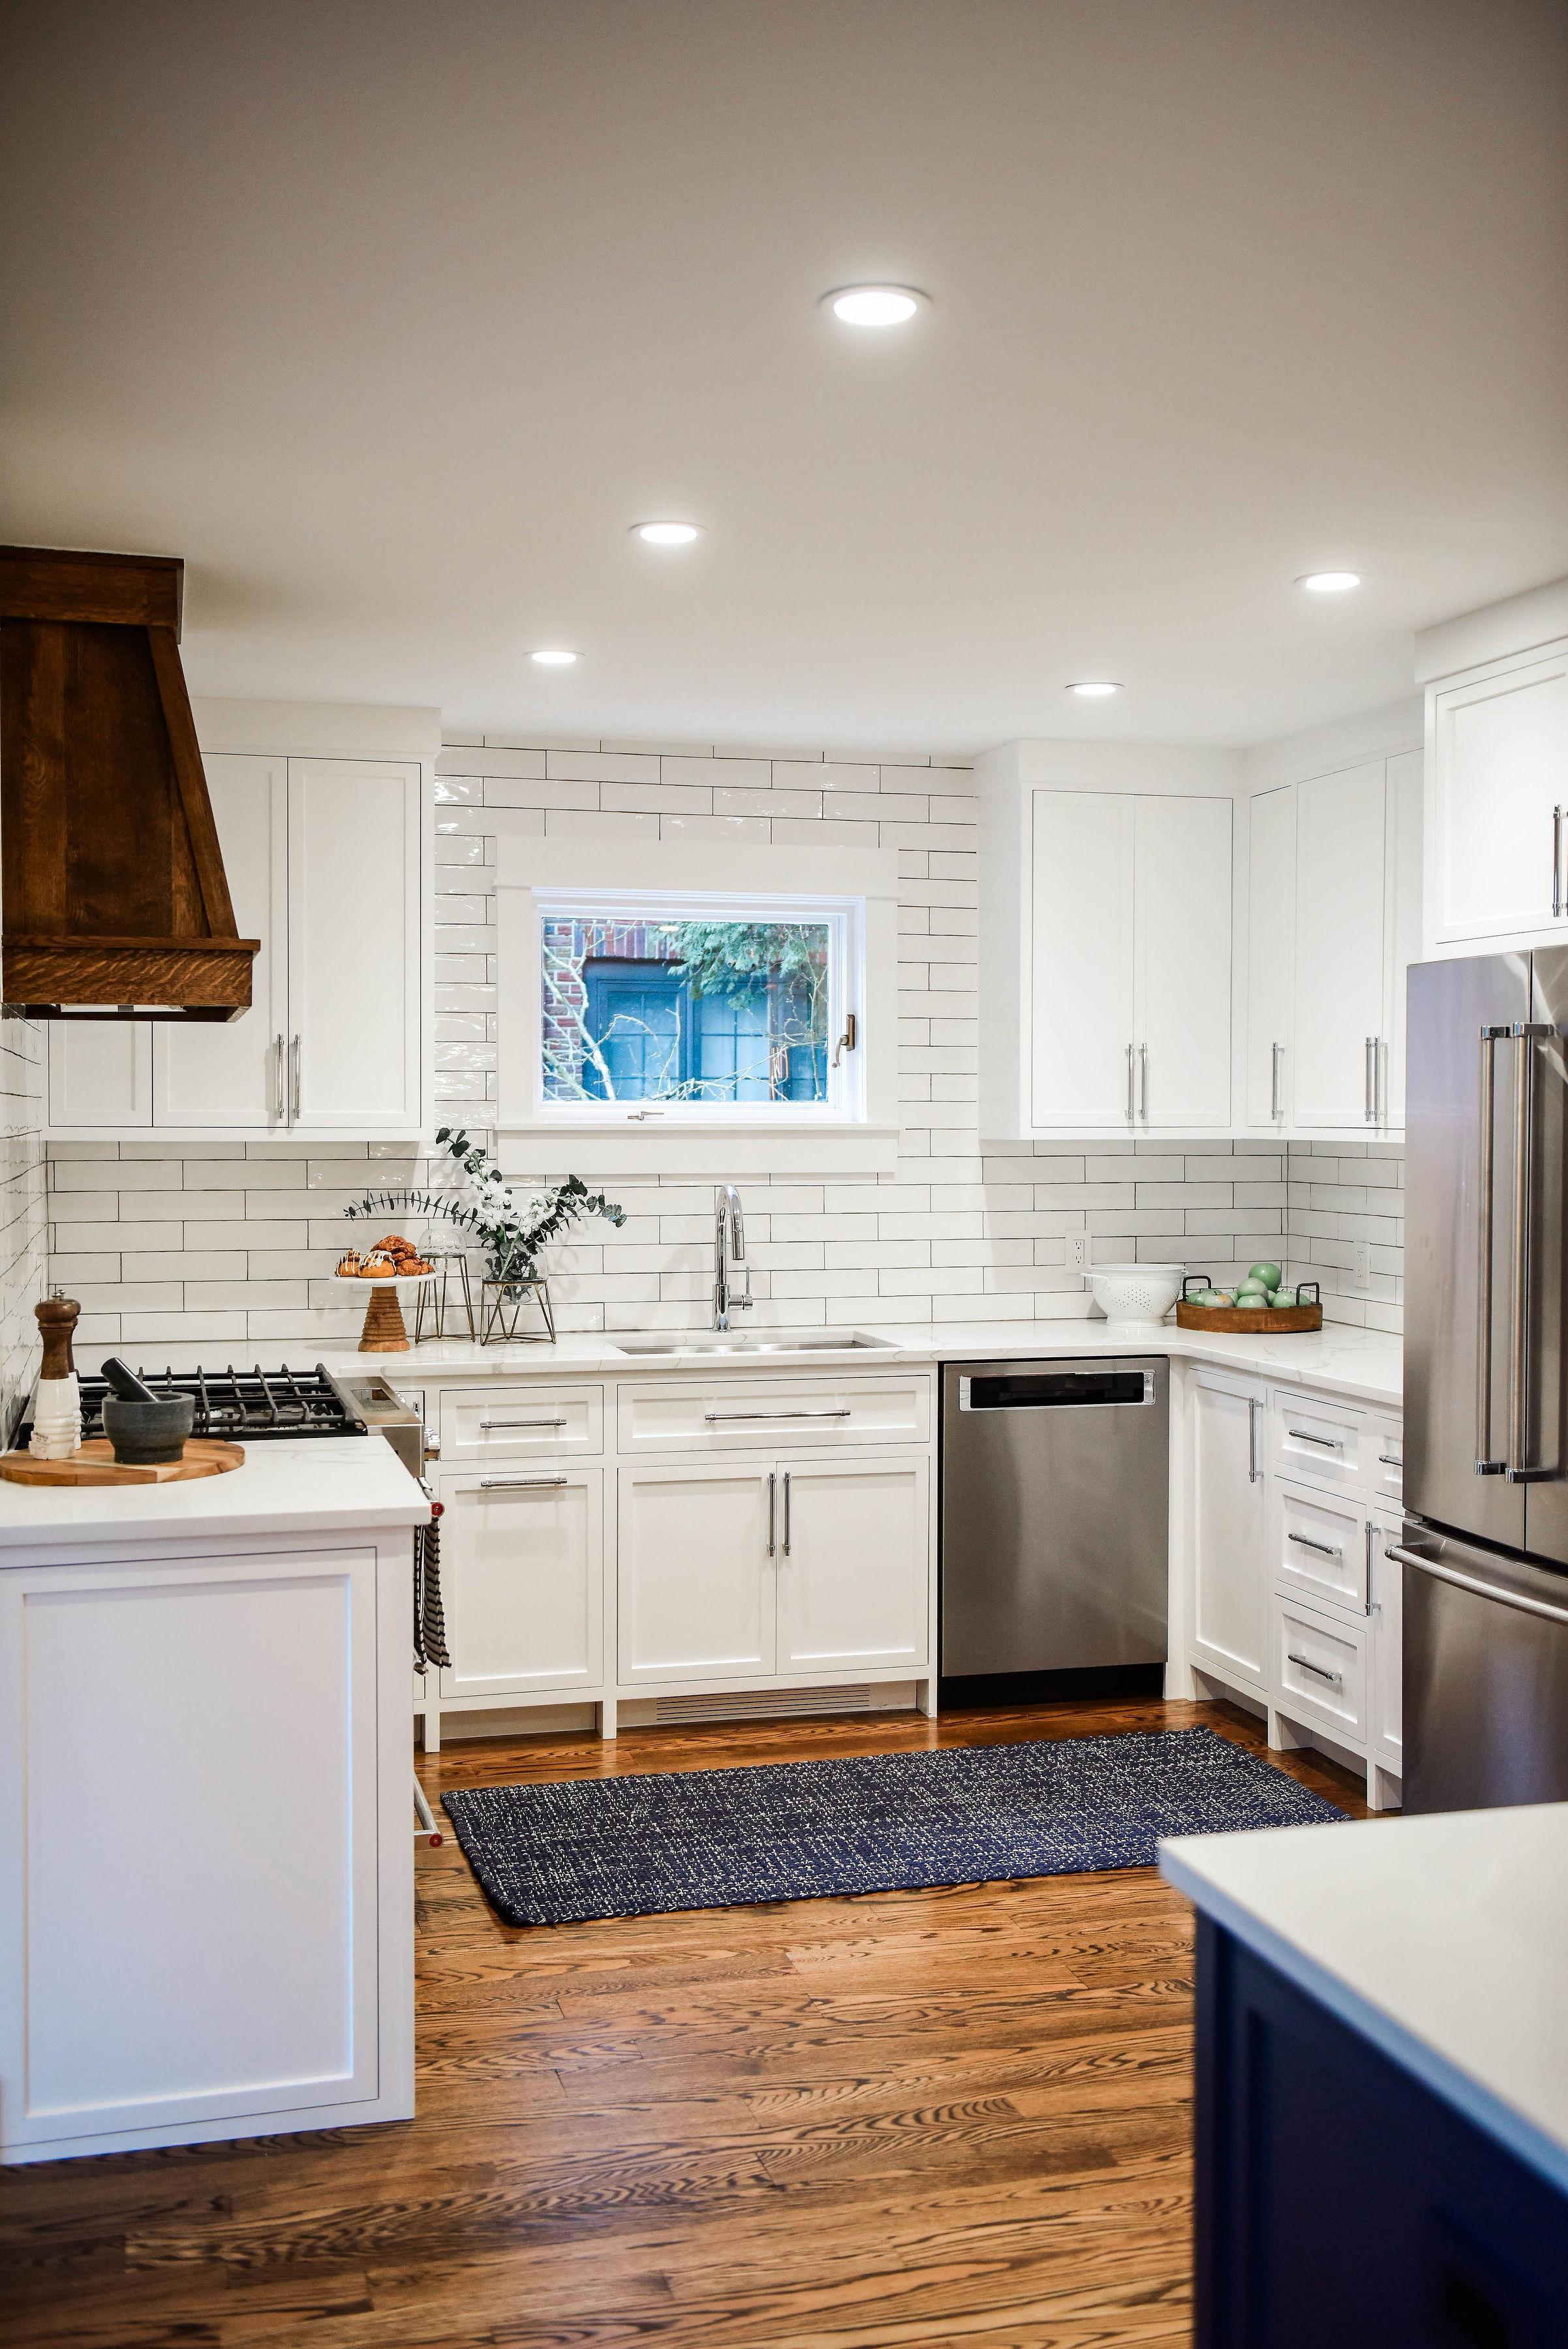 white kitchen inset cabinets subway tile.jpg